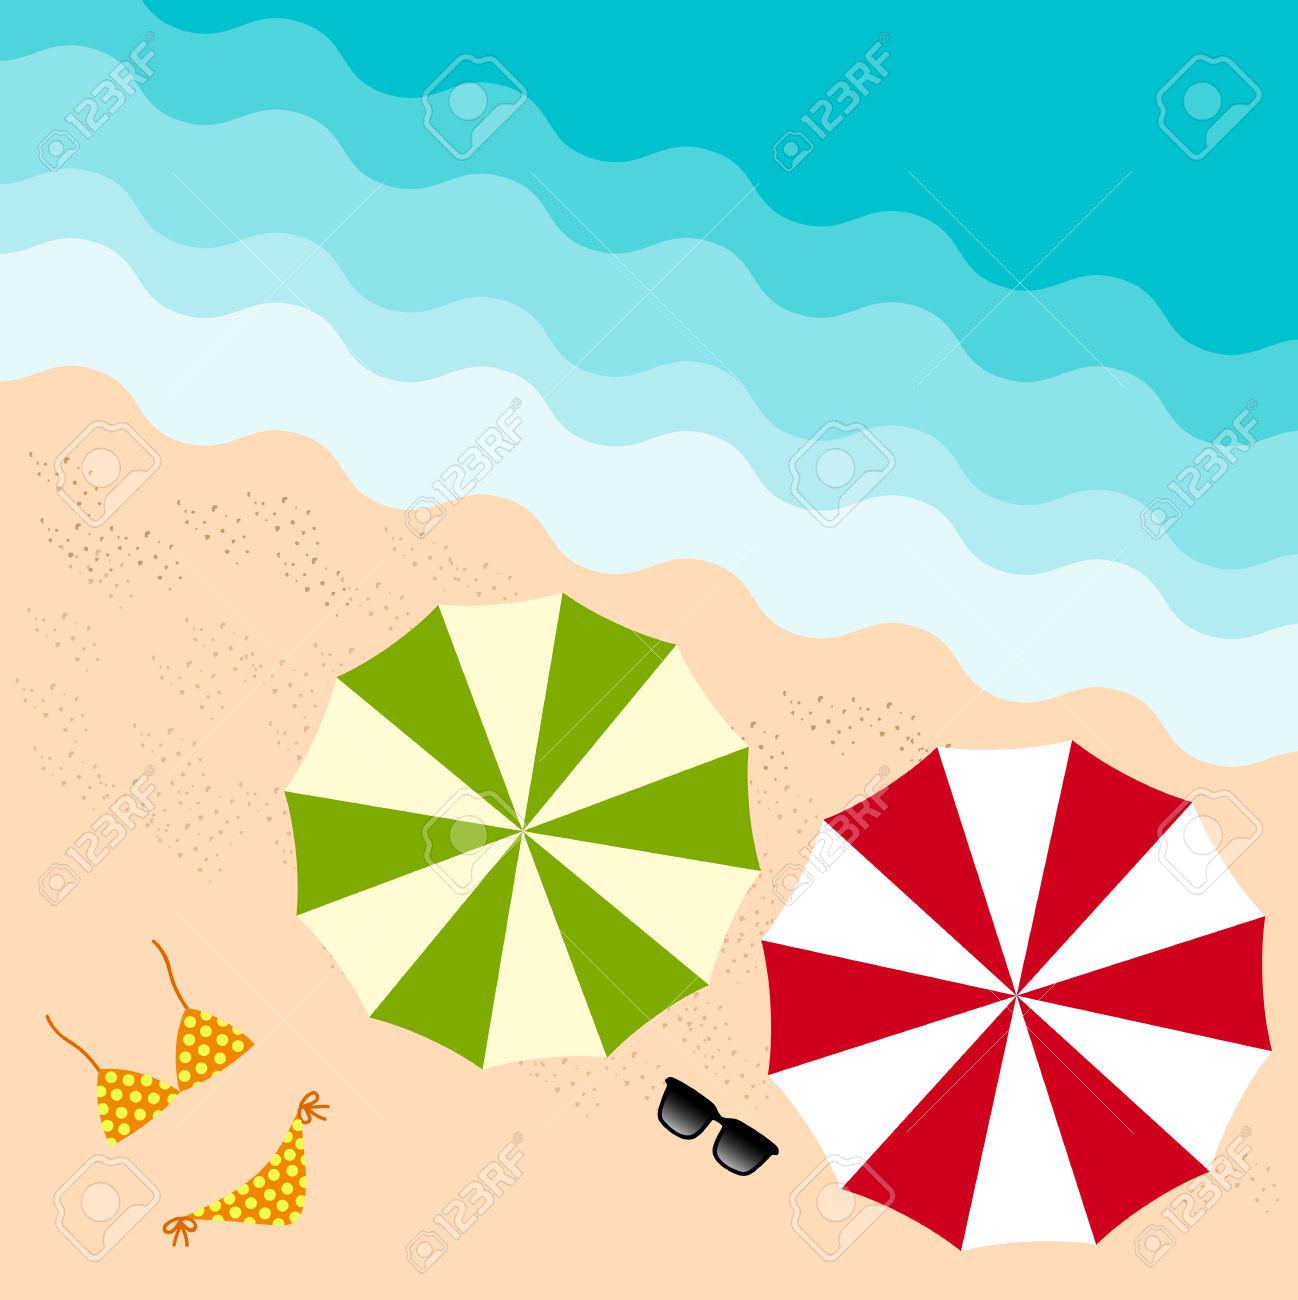 Colorful Umbrella, Sun Glass And Bikini On The Beach In Summer.